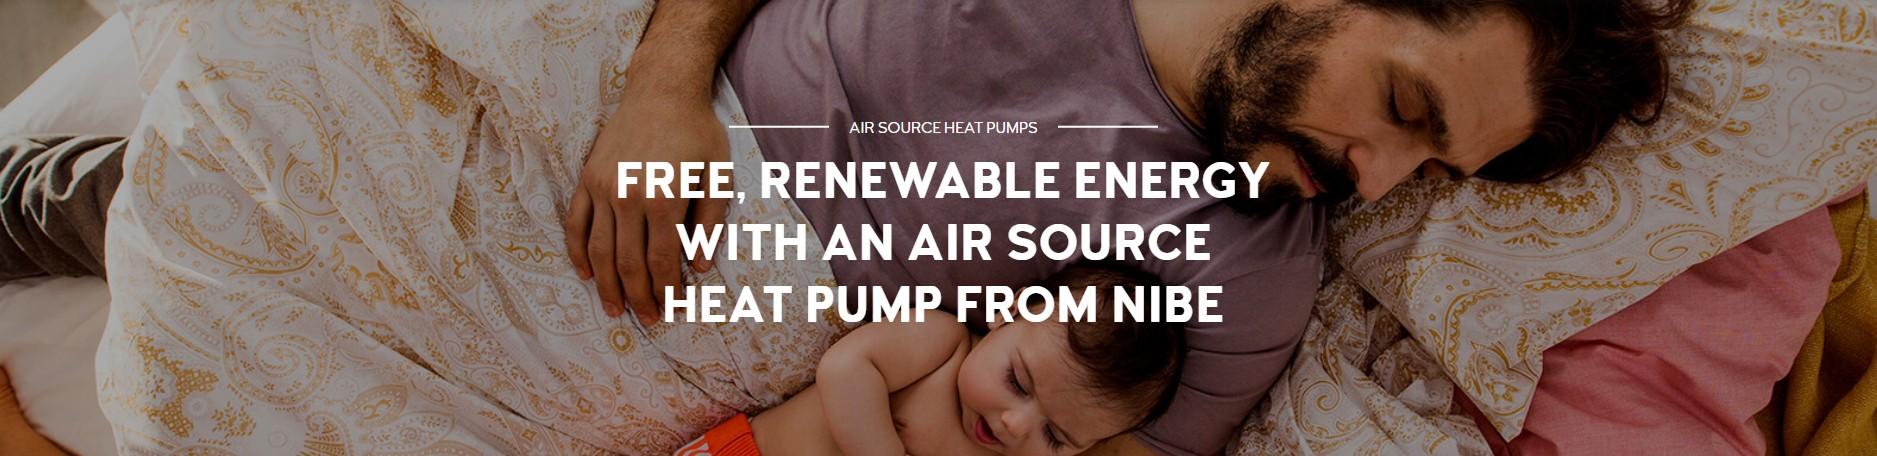 Air Source Heat Pump Grants England